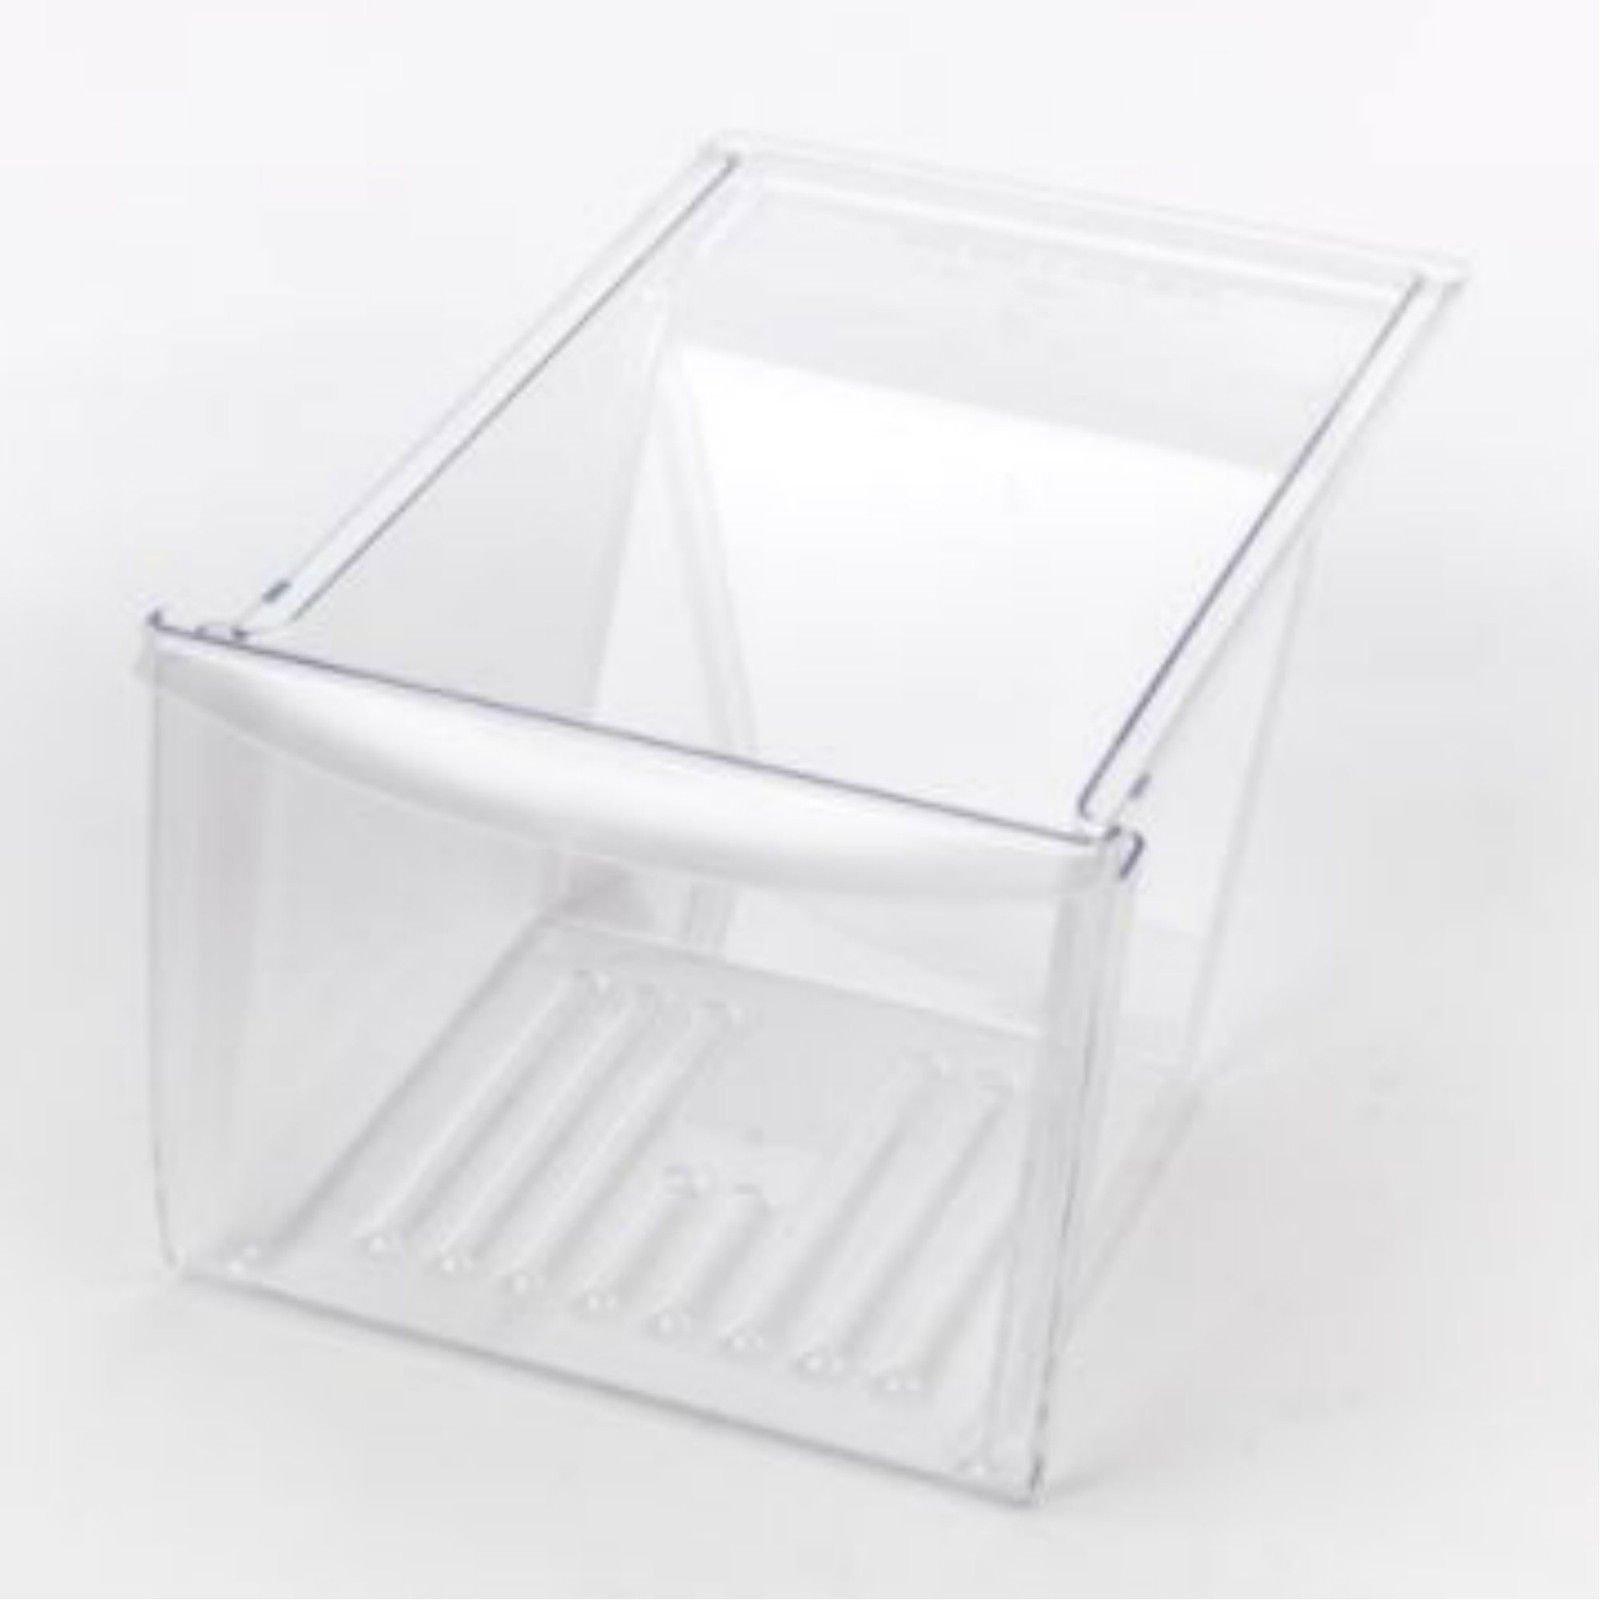 (USA Warehouse) 240337103 Refrigerator Crisper Drawer | Vegetable Drawer -/PT# HF983-1754352665